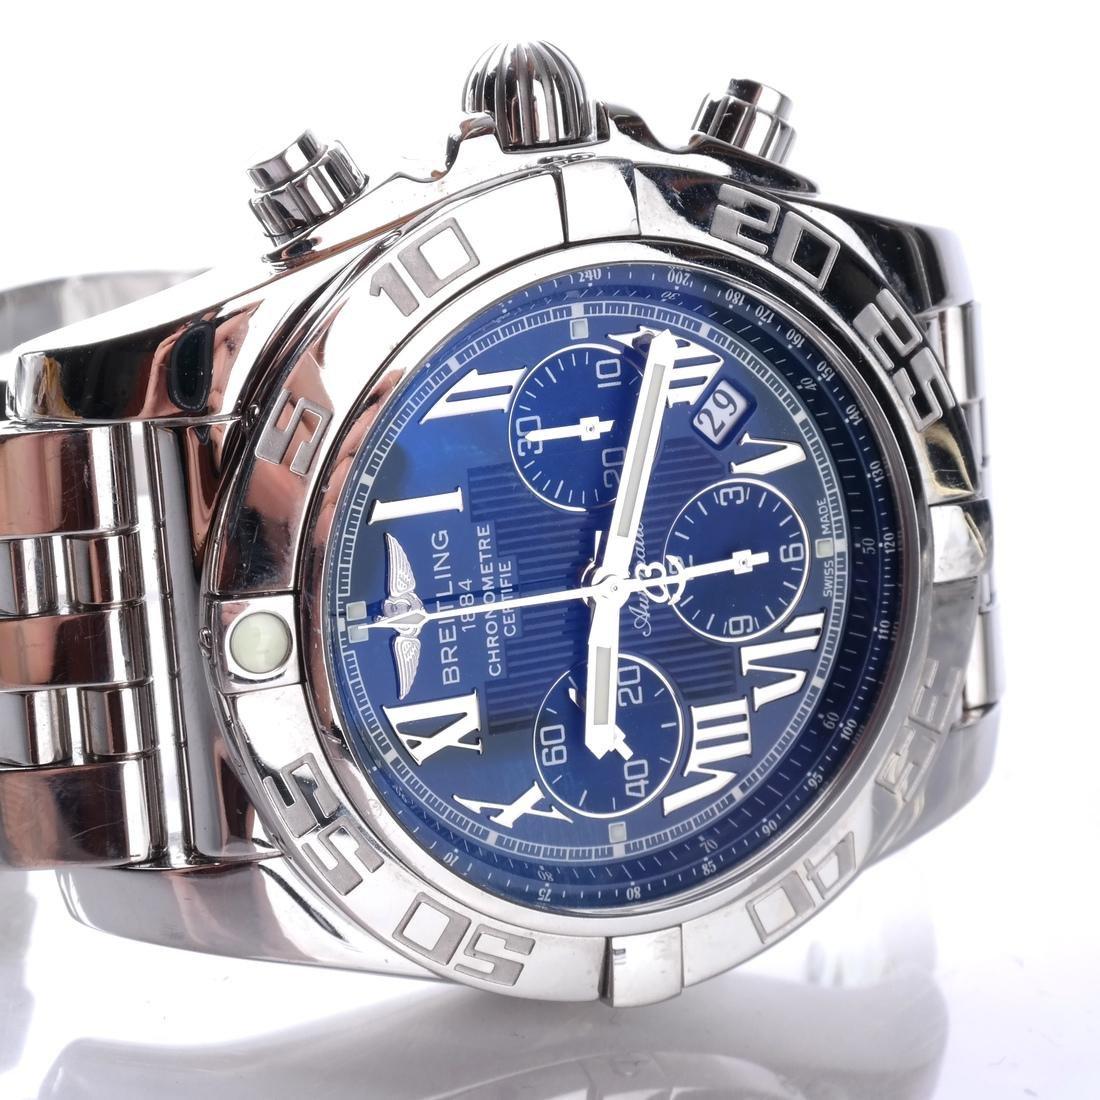 Breitling Chronomat AB0110 - 10